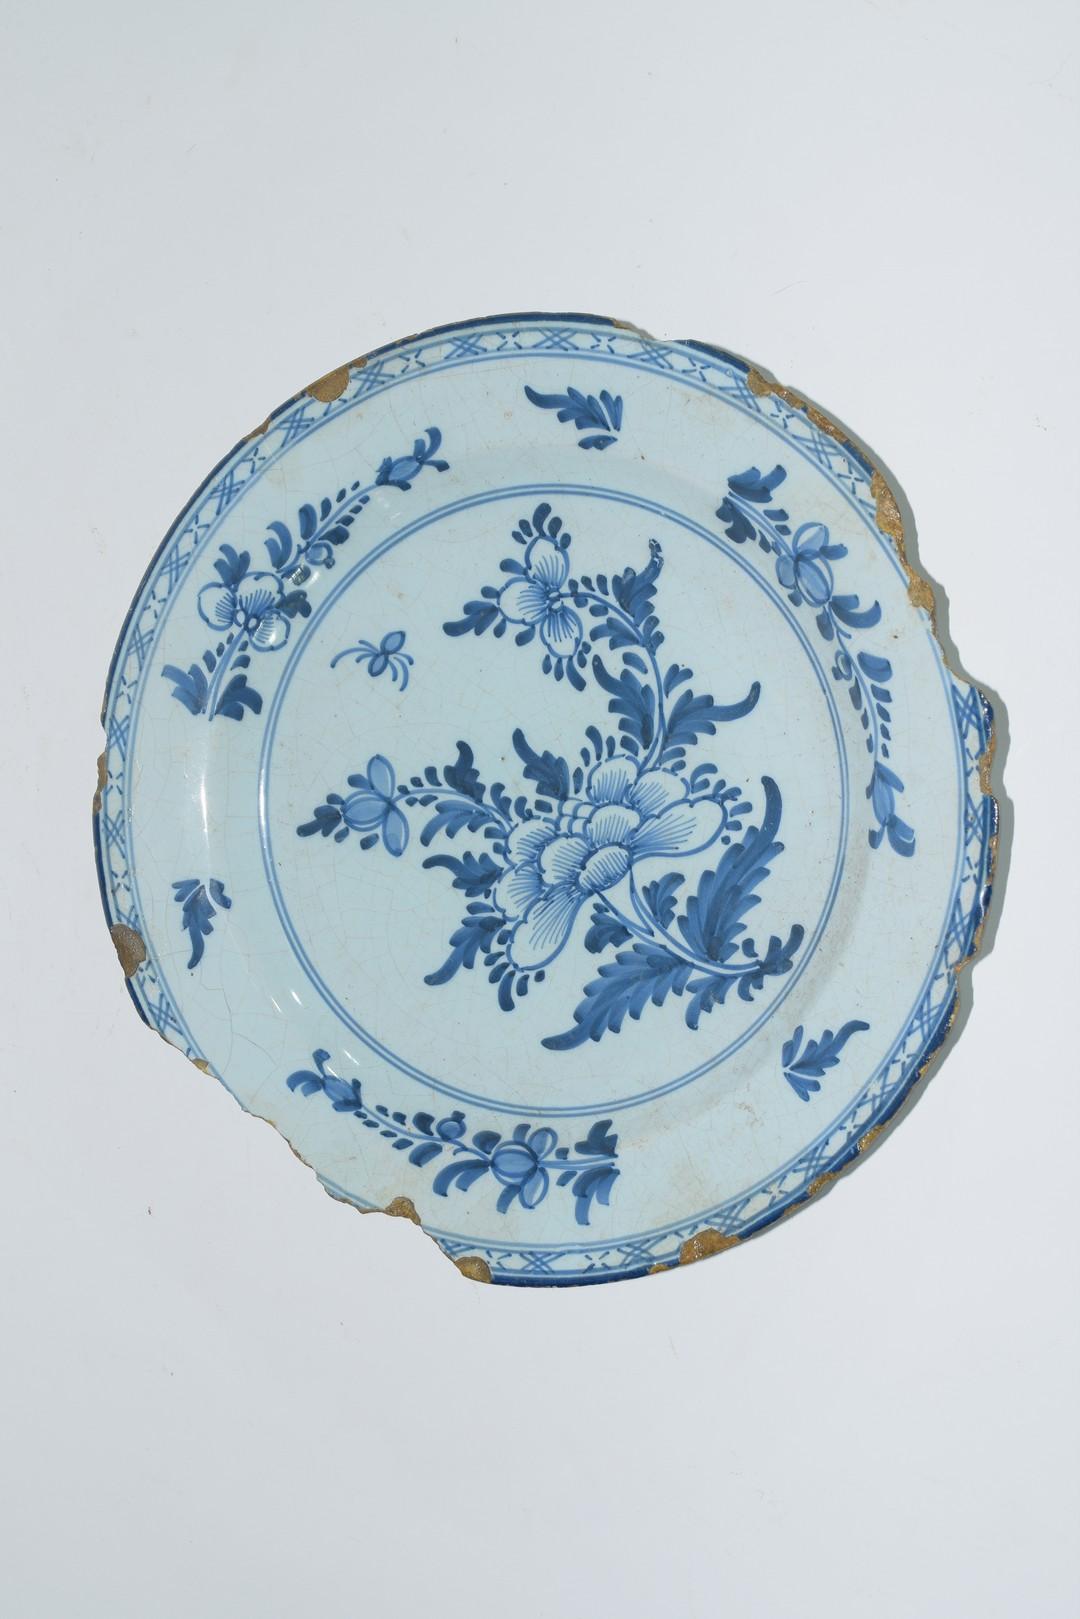 Three 18th century English Delft plates - Image 4 of 7